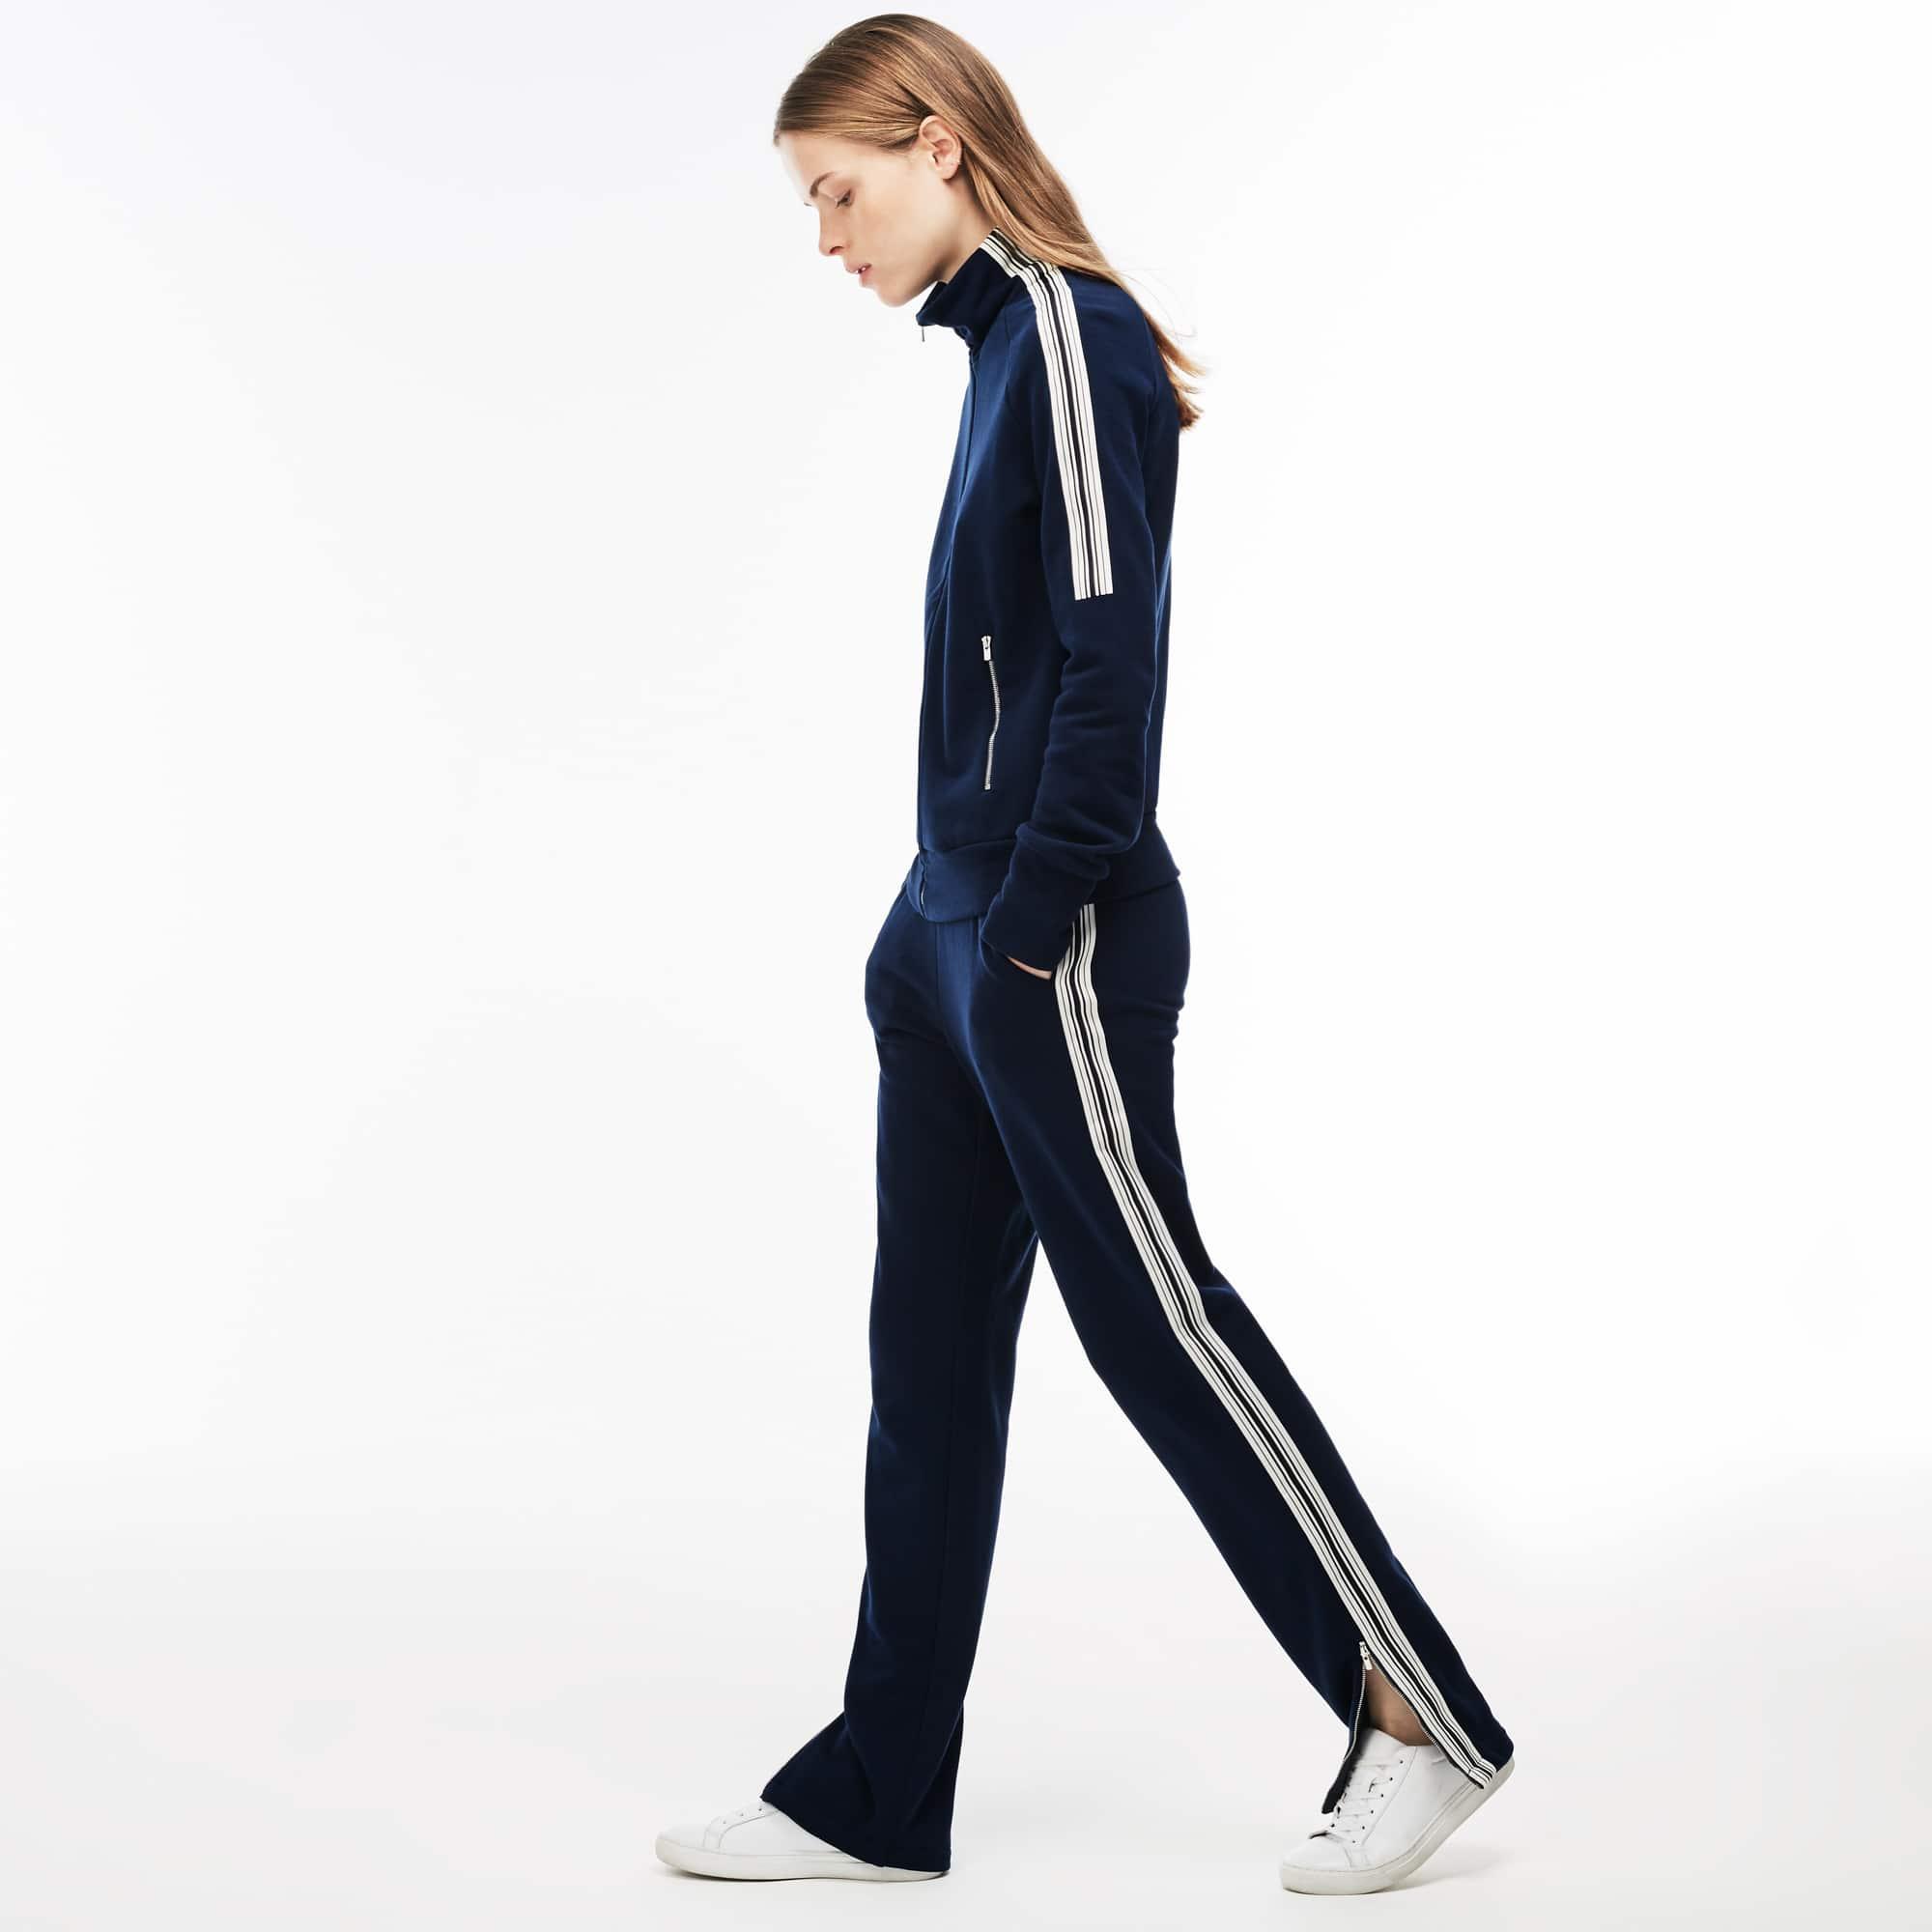 Urbane Damen-Jogginghose aus Krepp-Fleece mit Kontraststreifen